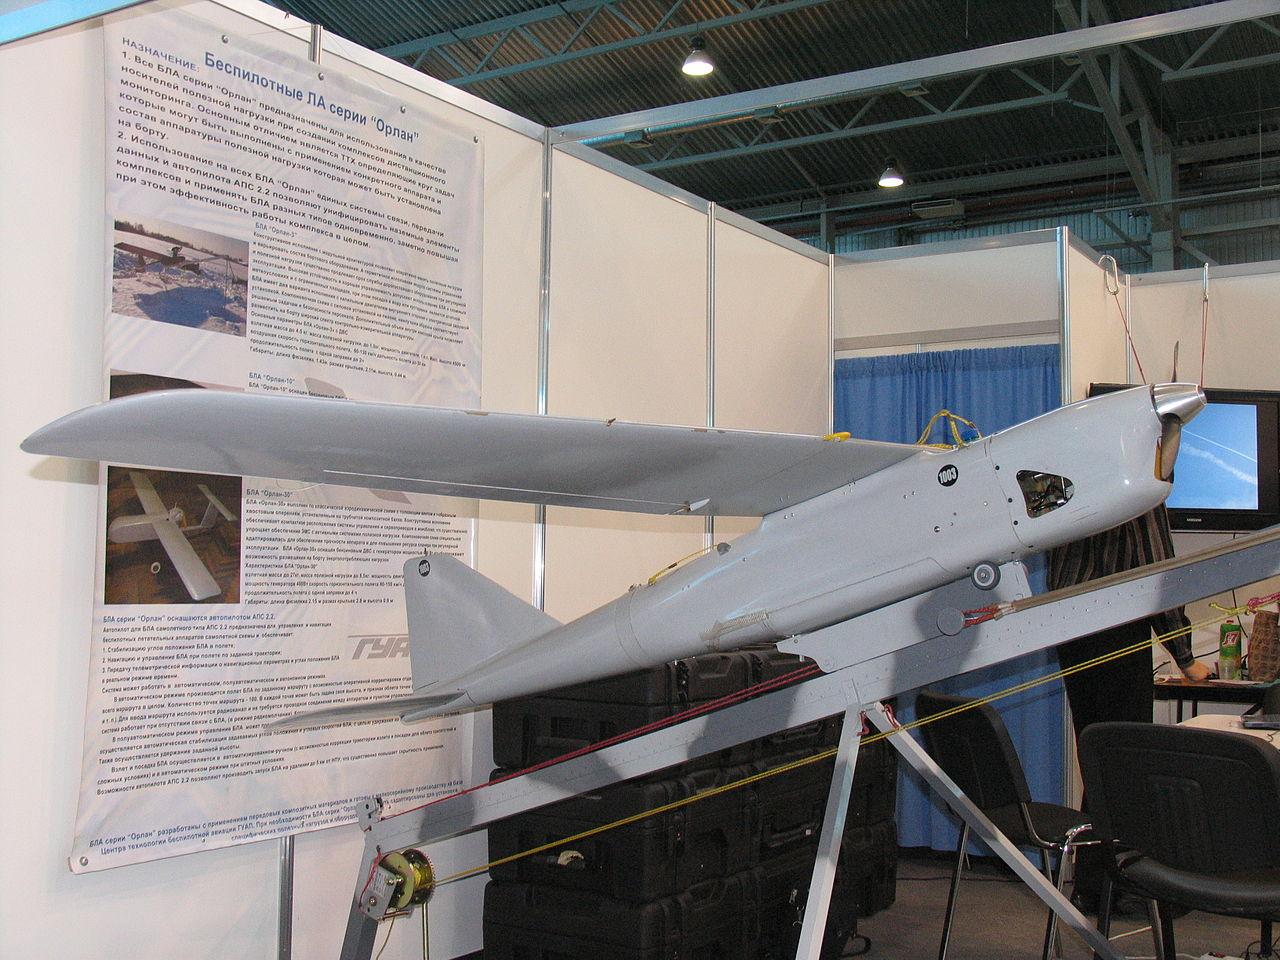 Orlan-10. Source: wikipedia.org